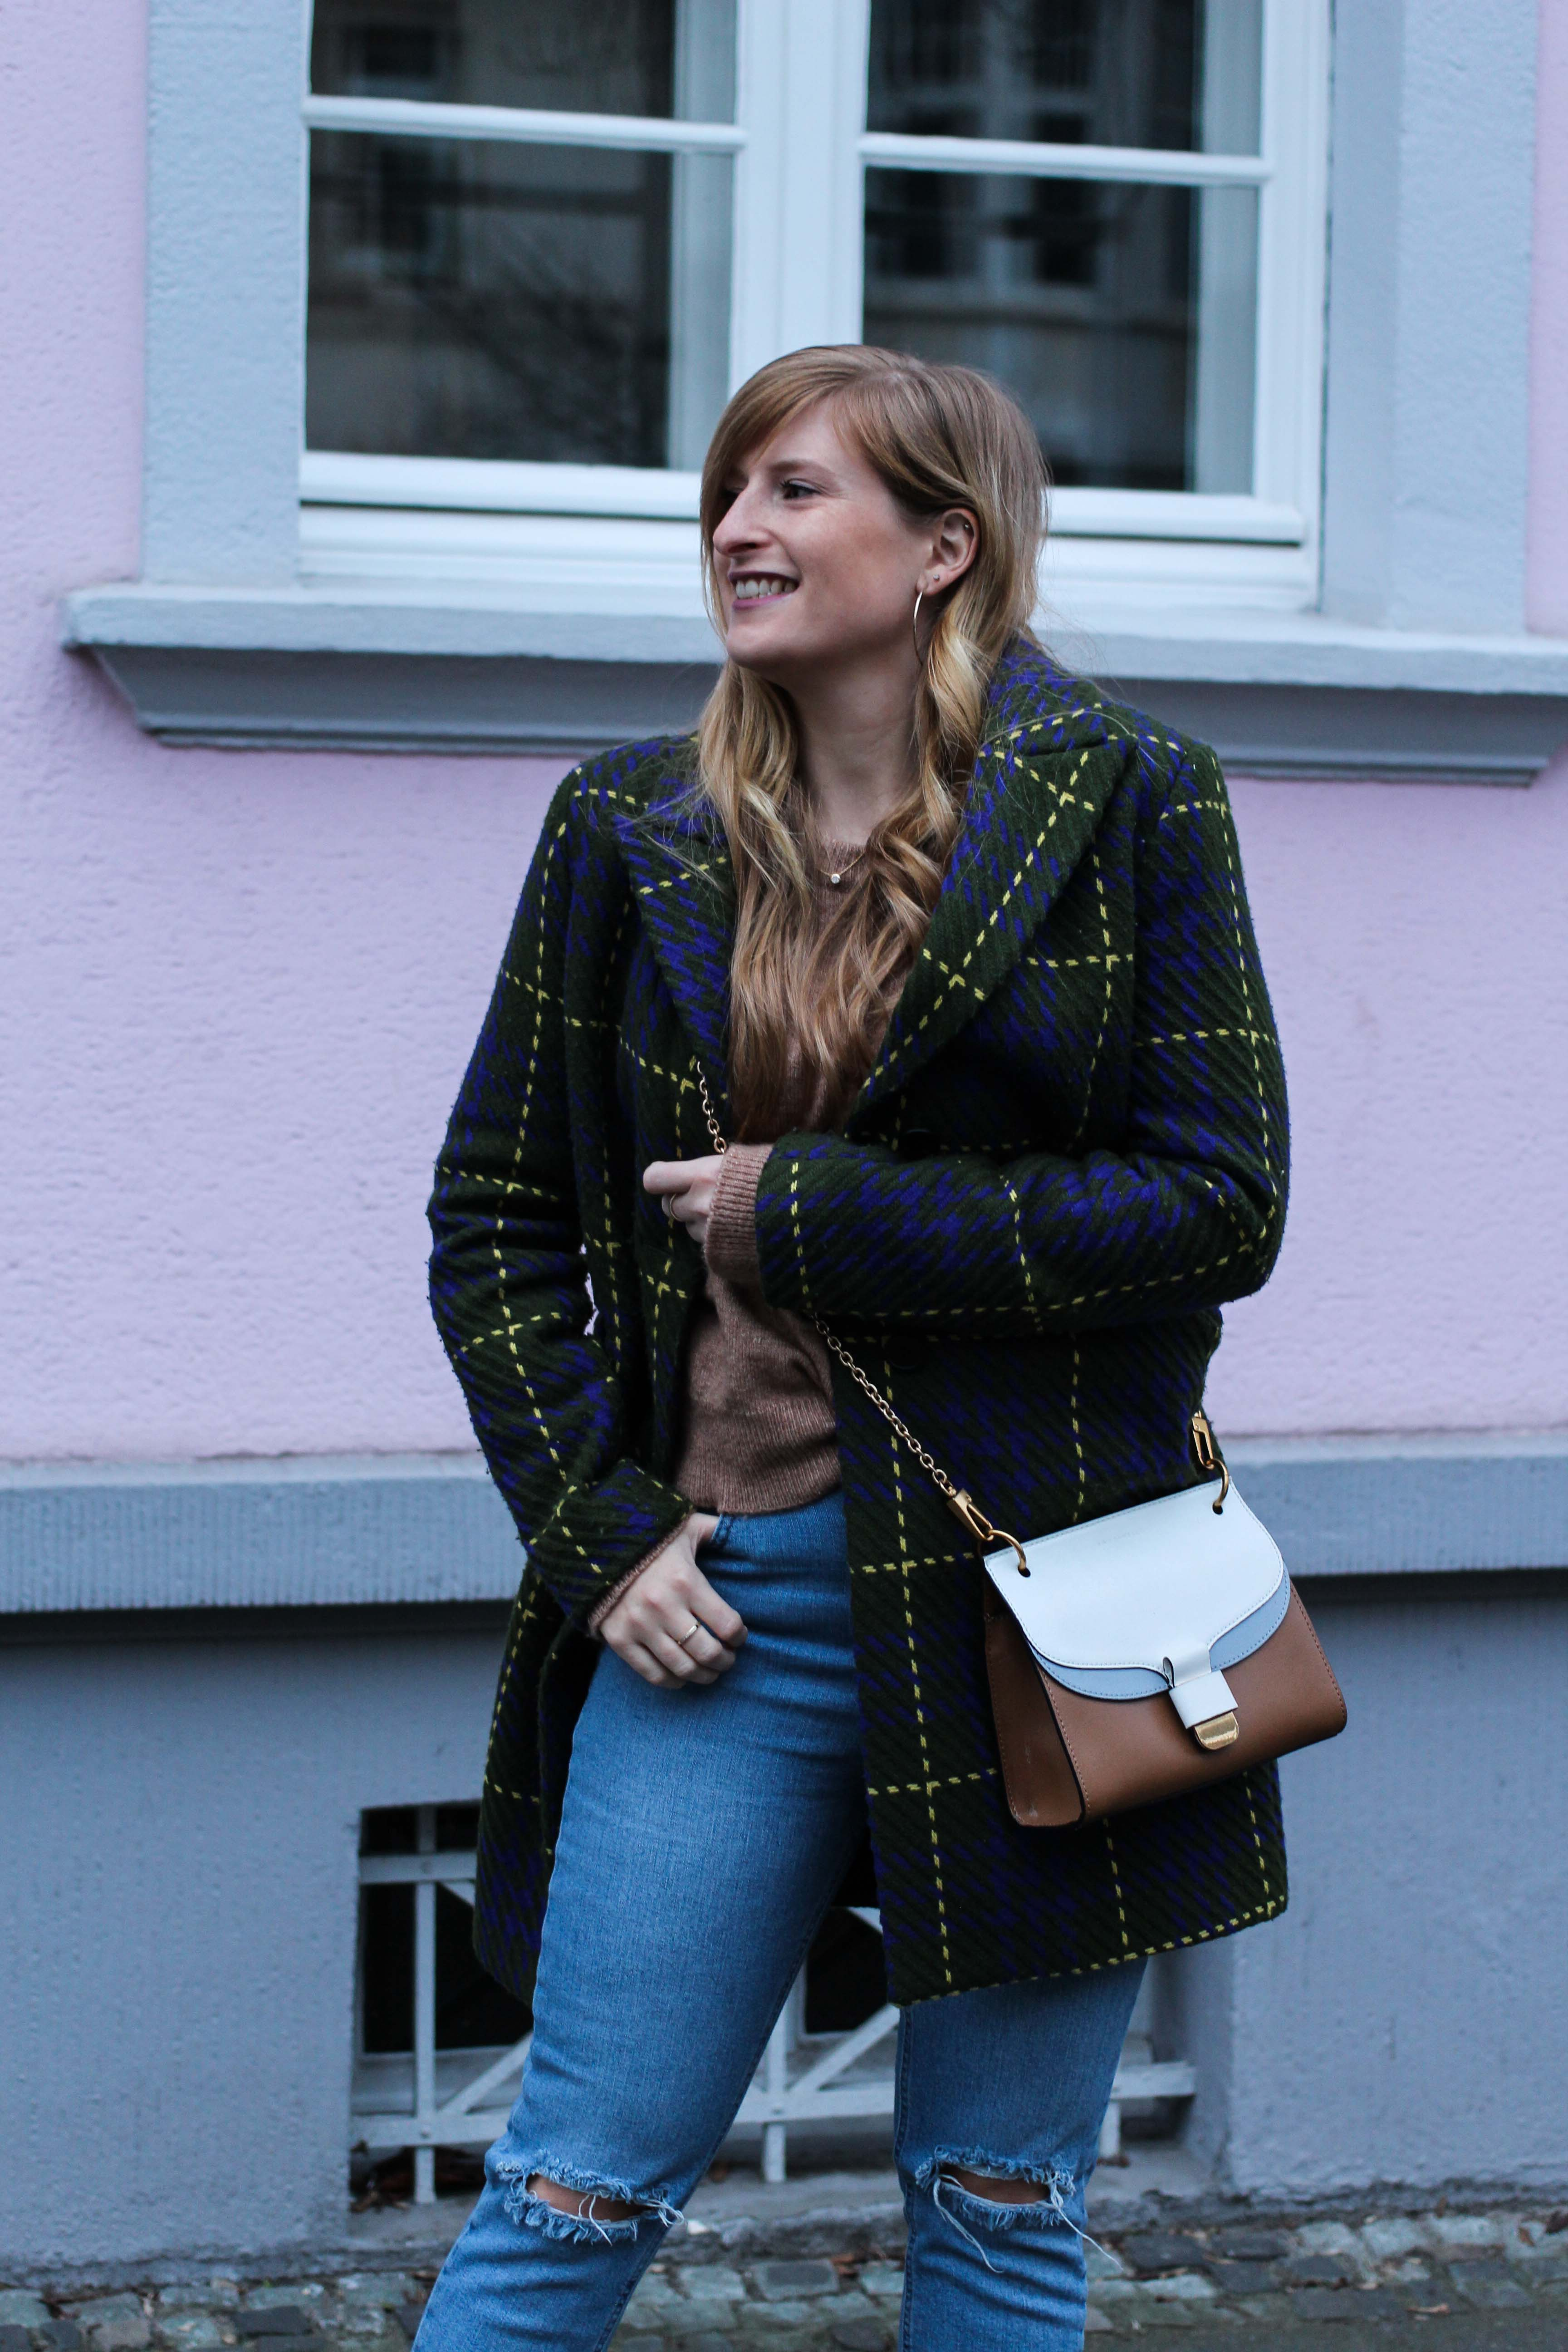 Herbst Must-Have 2019 Karomantel. Herbstmode Herbsttrend Mantel karriert Modeblog Outfit Herbst Fashion Blog Bonn 6